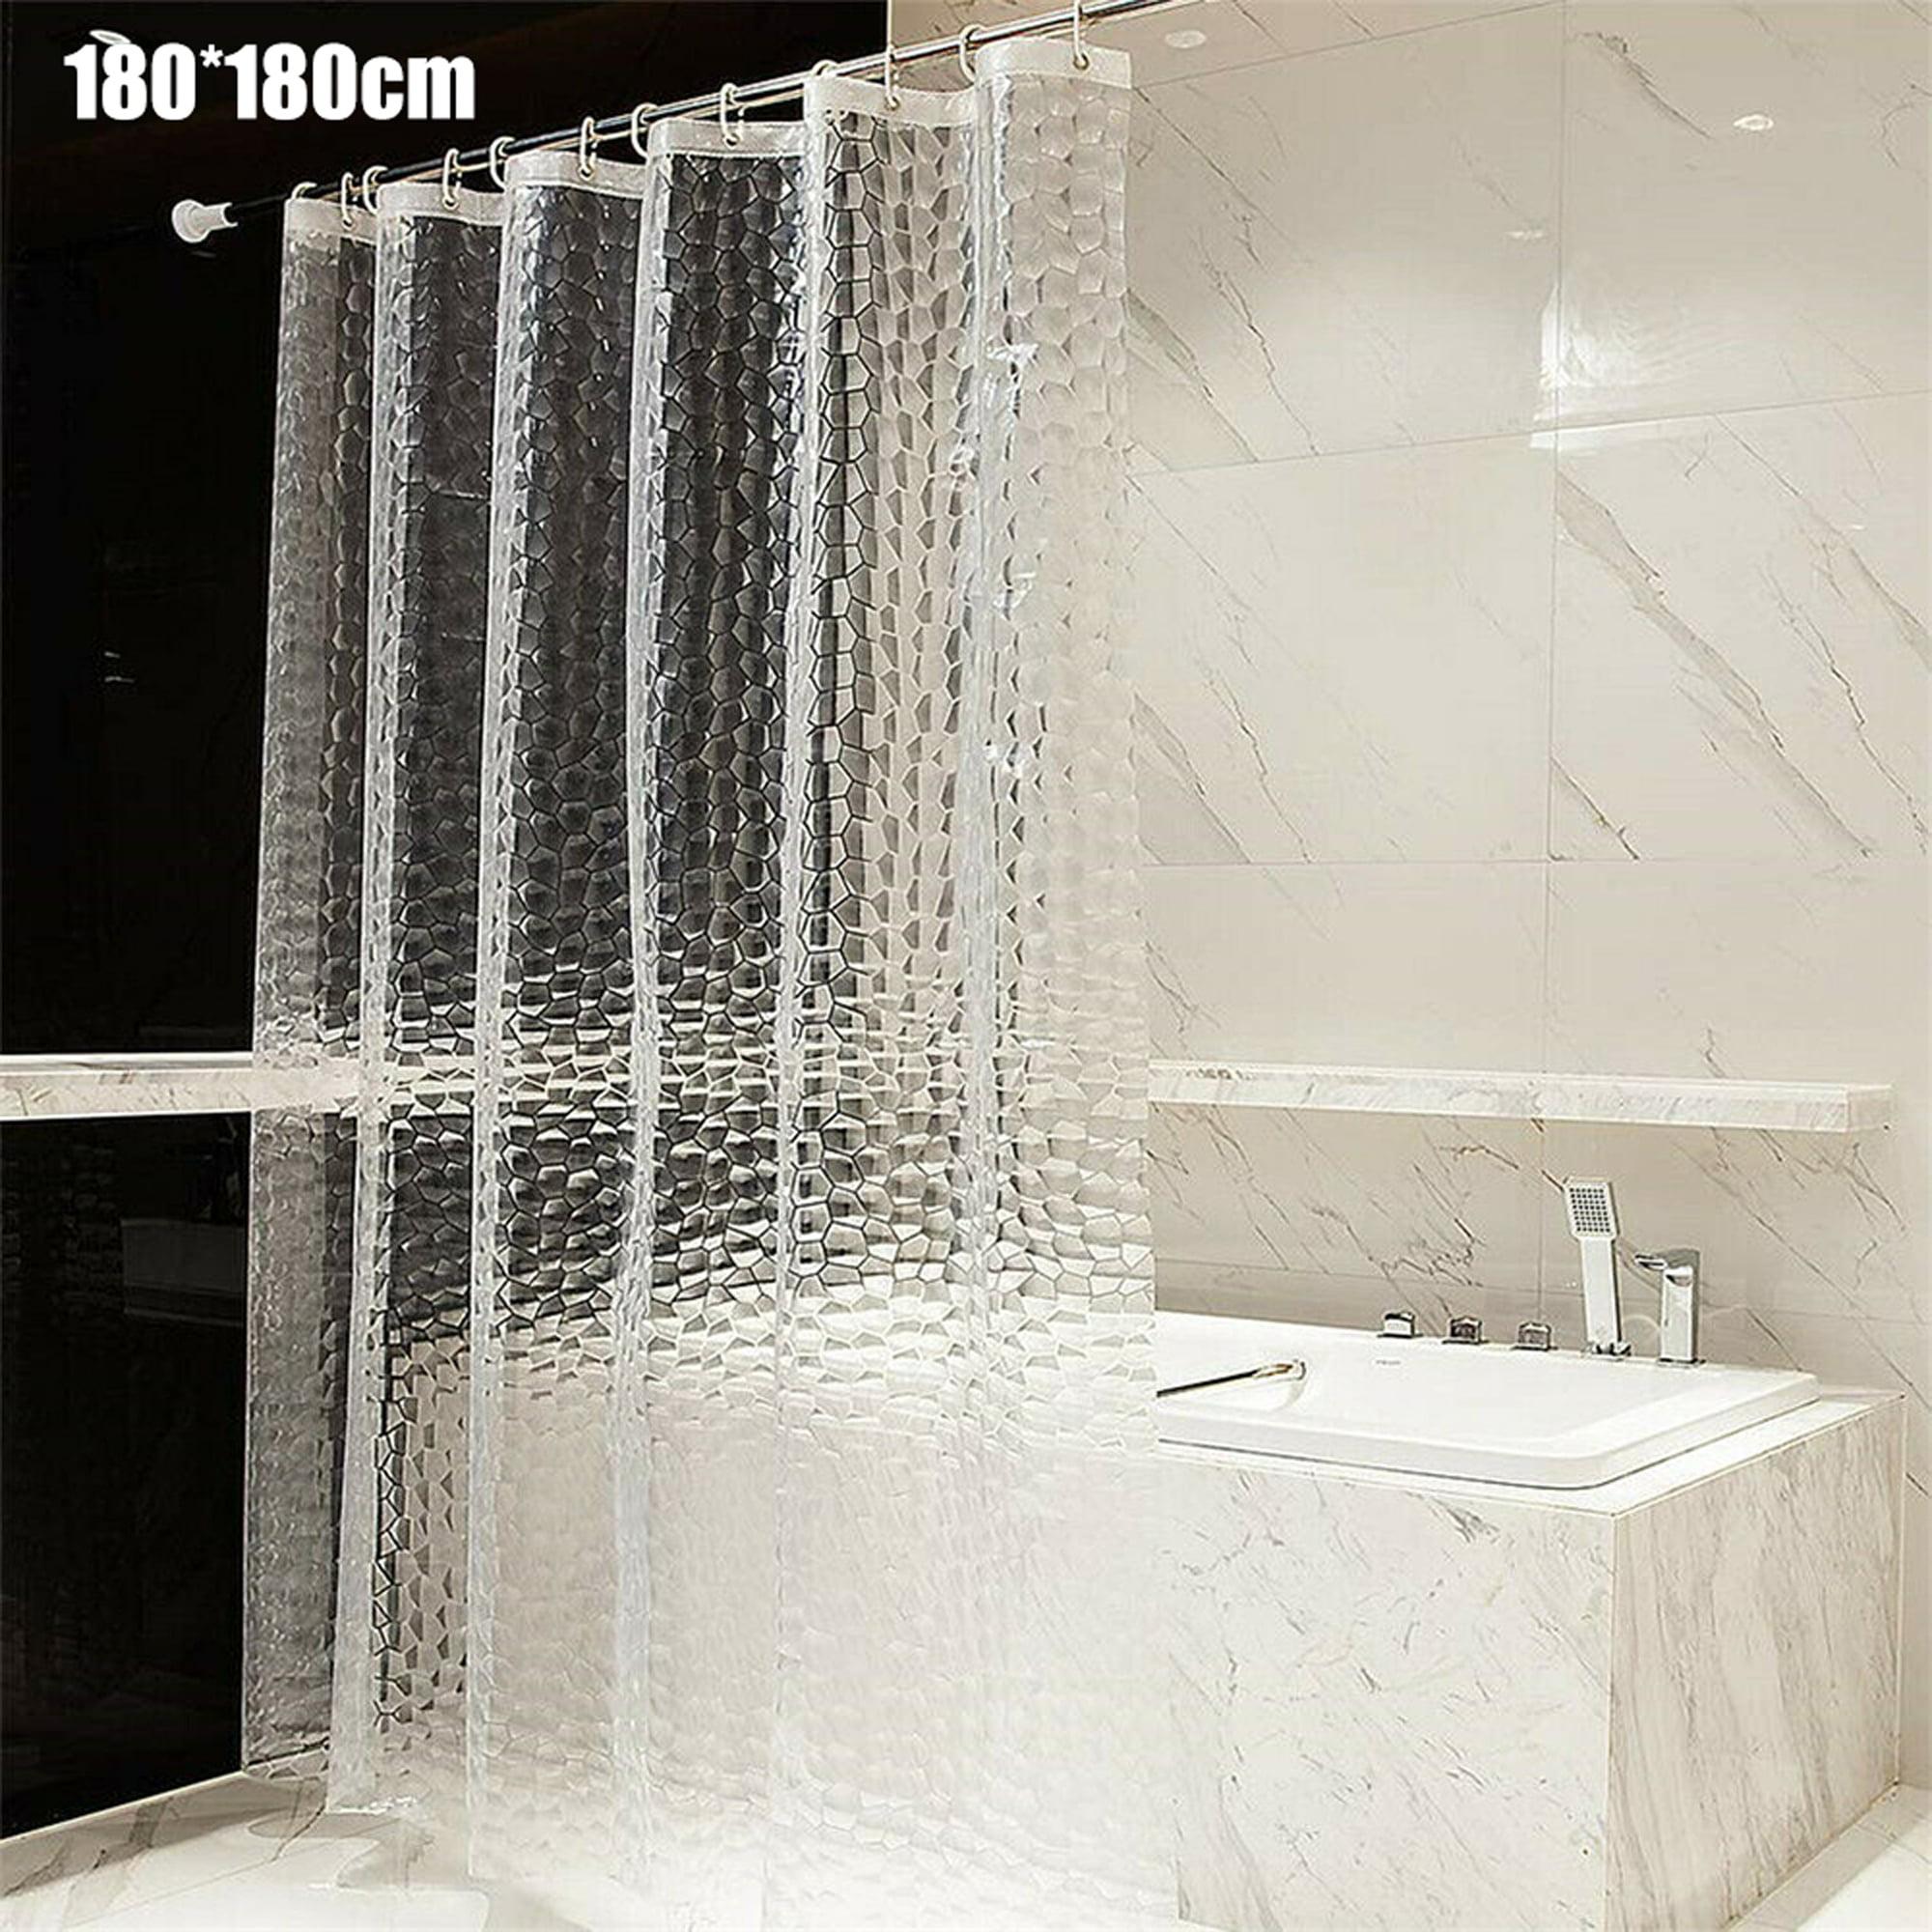 Transparent 3D Water Cube Design Shower Curtain Bathroom Waterproof Fabric